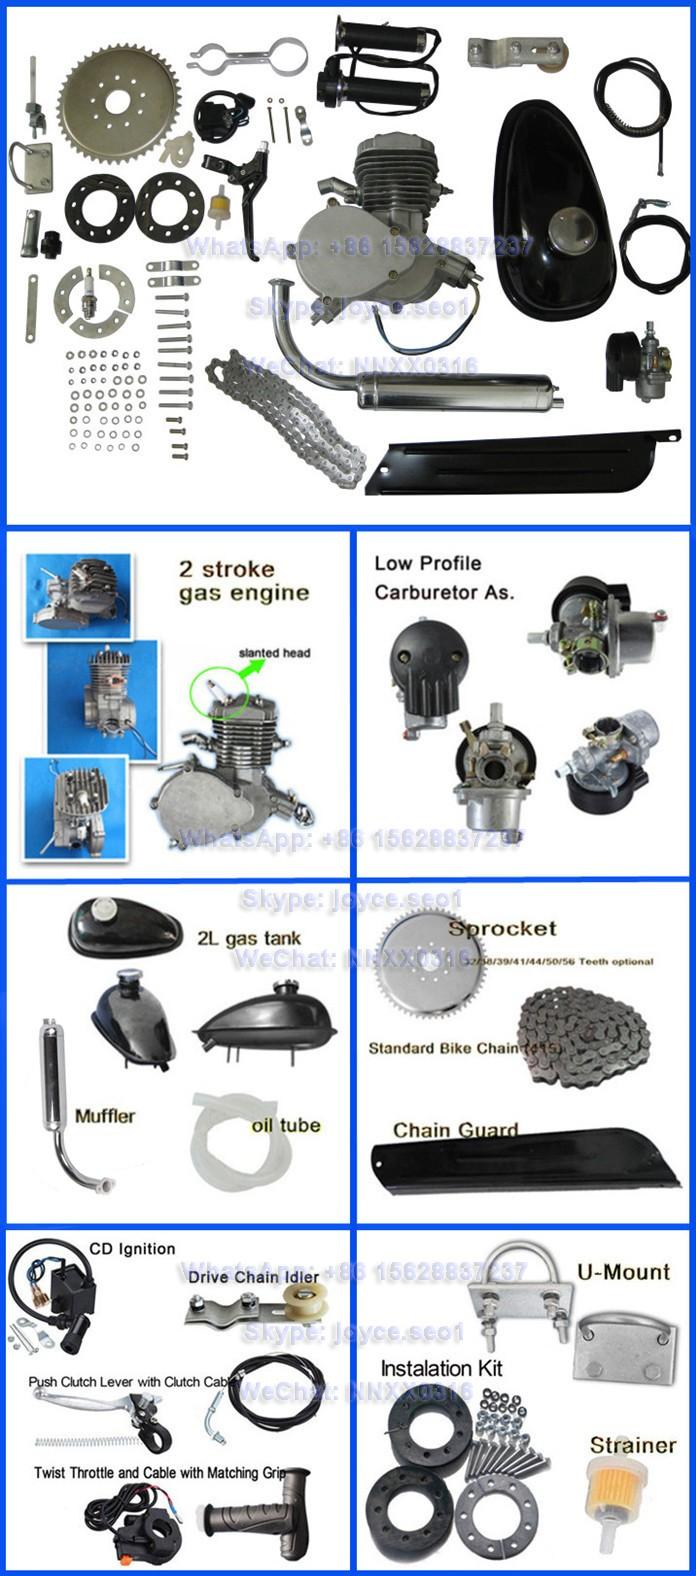 medium resolution of kick start 48cc 49cc 50cc 60cc 66cc f80 80 cc 2 stroke bike gasoline bicycle motor